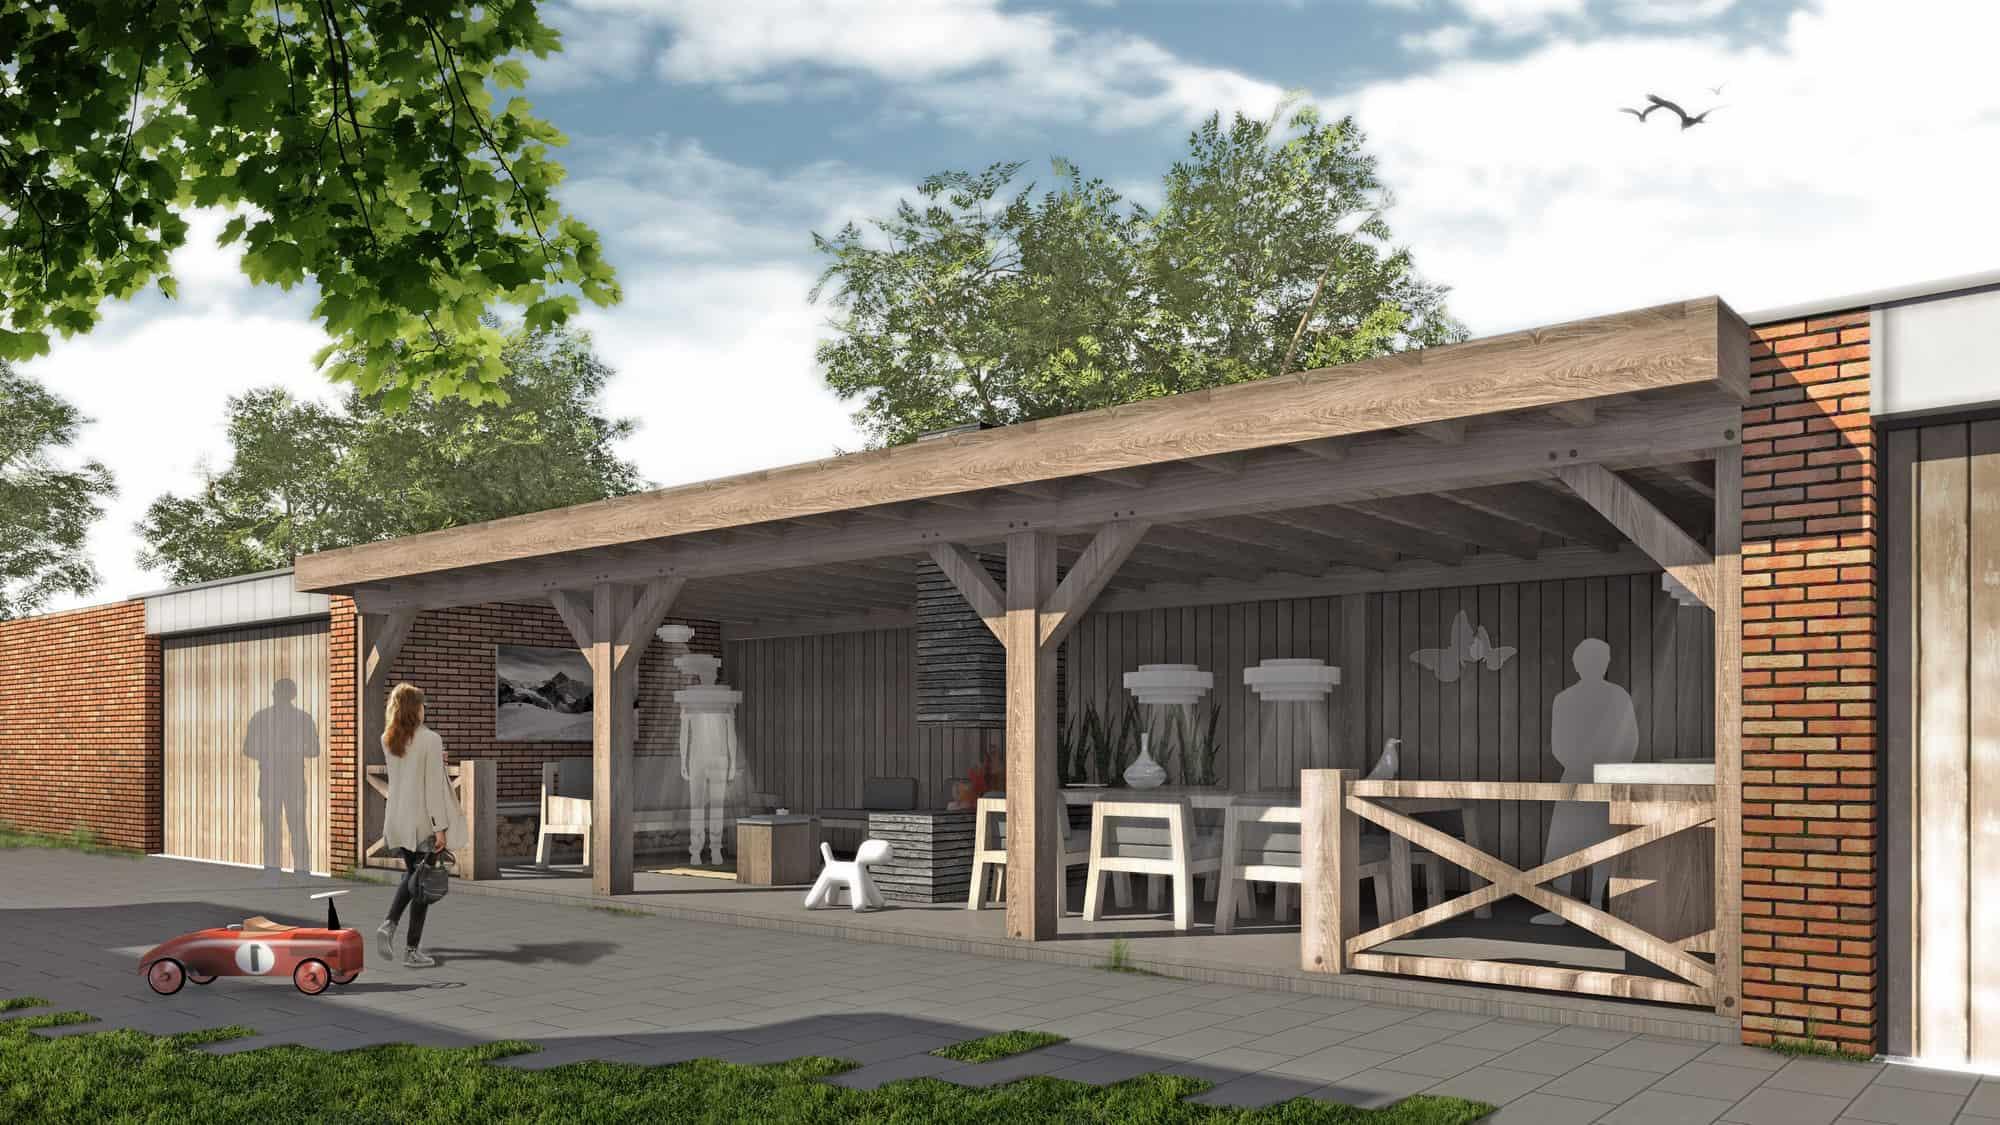 Garage Met Veranda : Veranda en garage alblasserdam roest architectuur